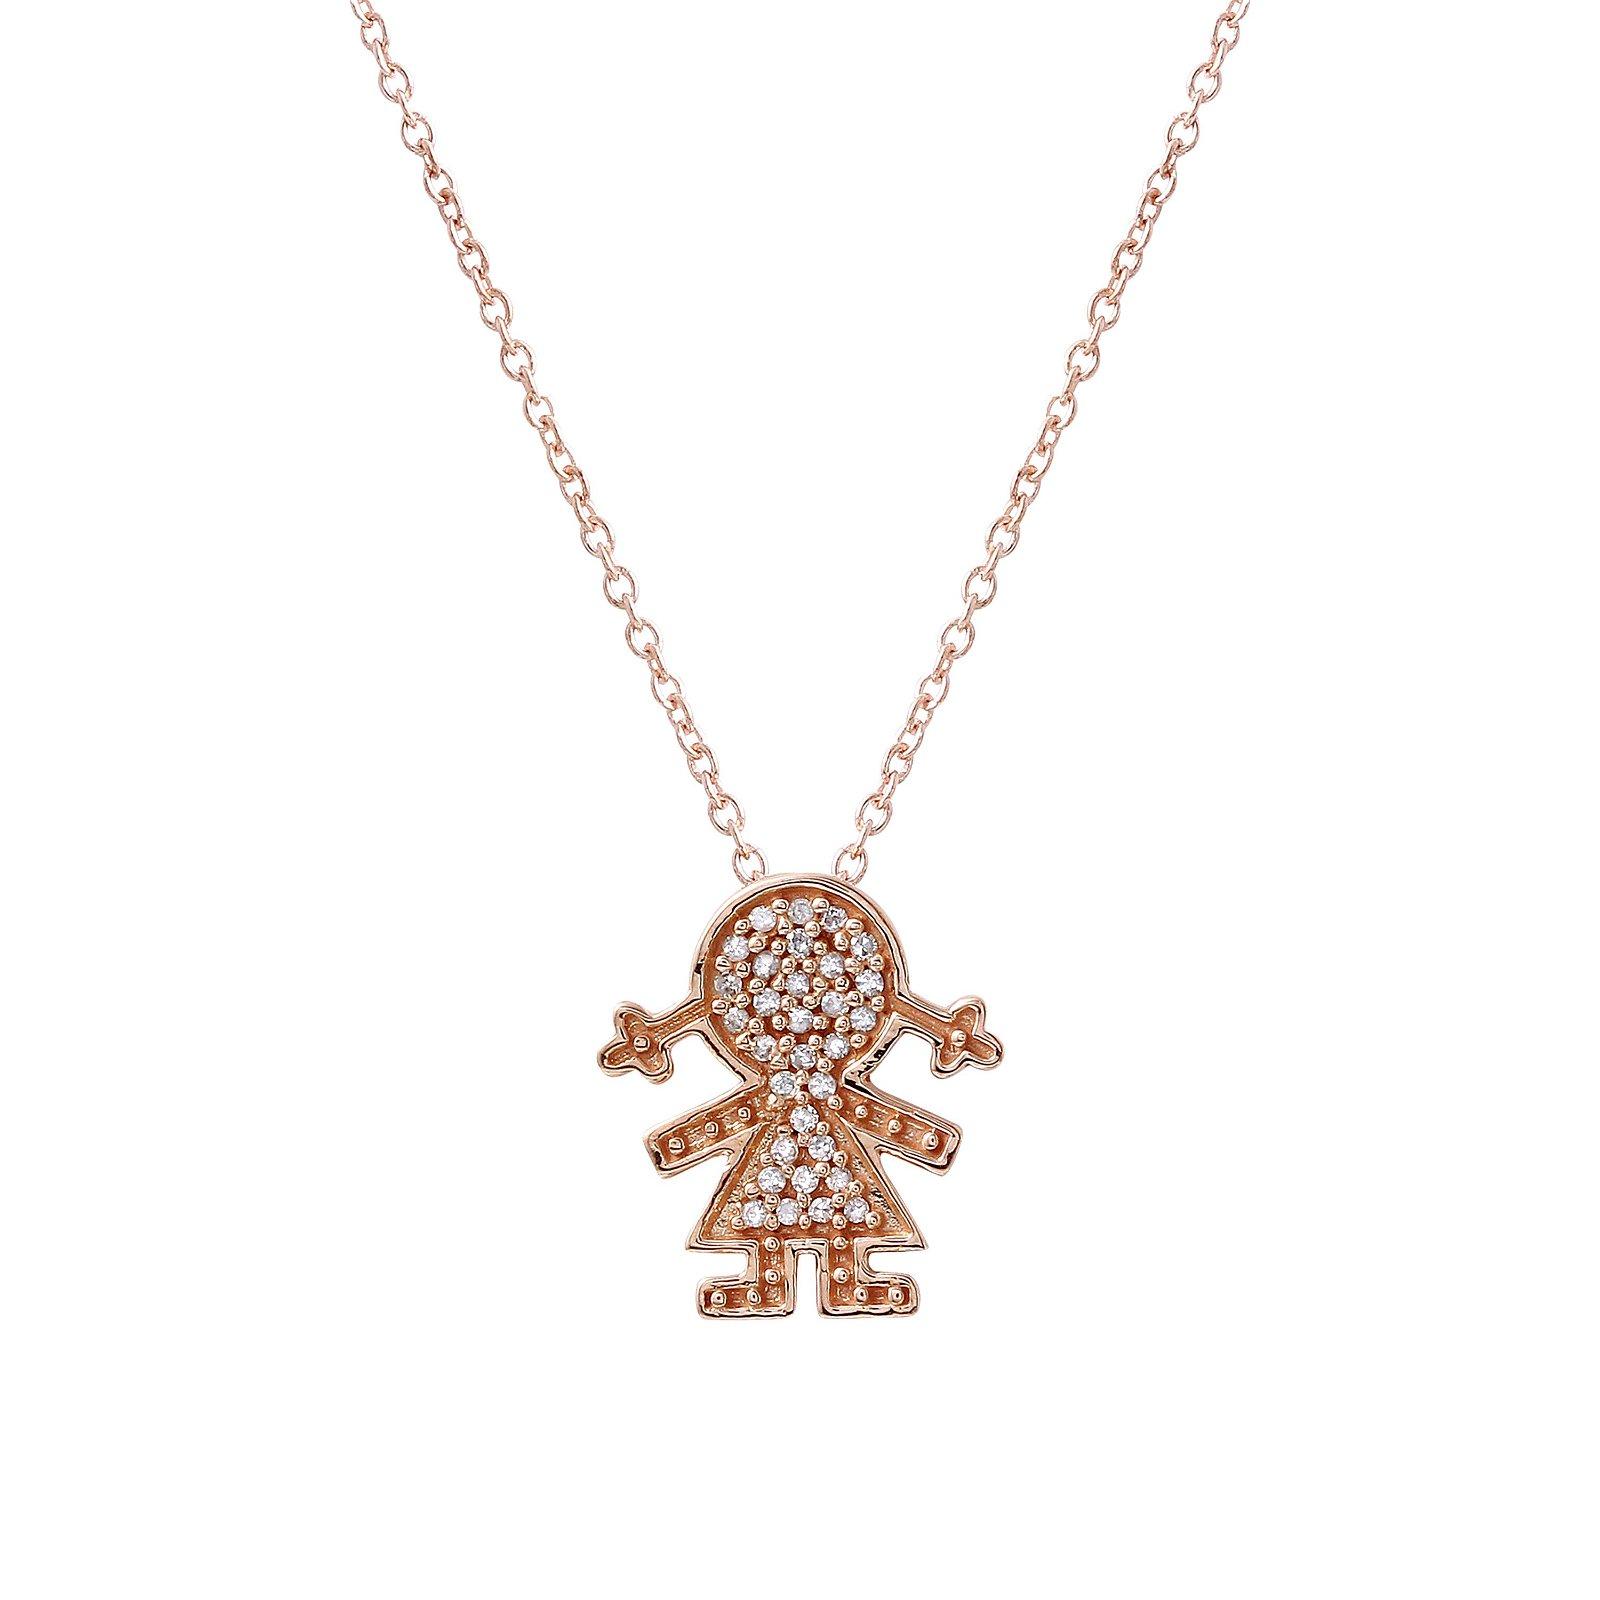 0.11 CTW Diamond Necklace 14K Rose Gold